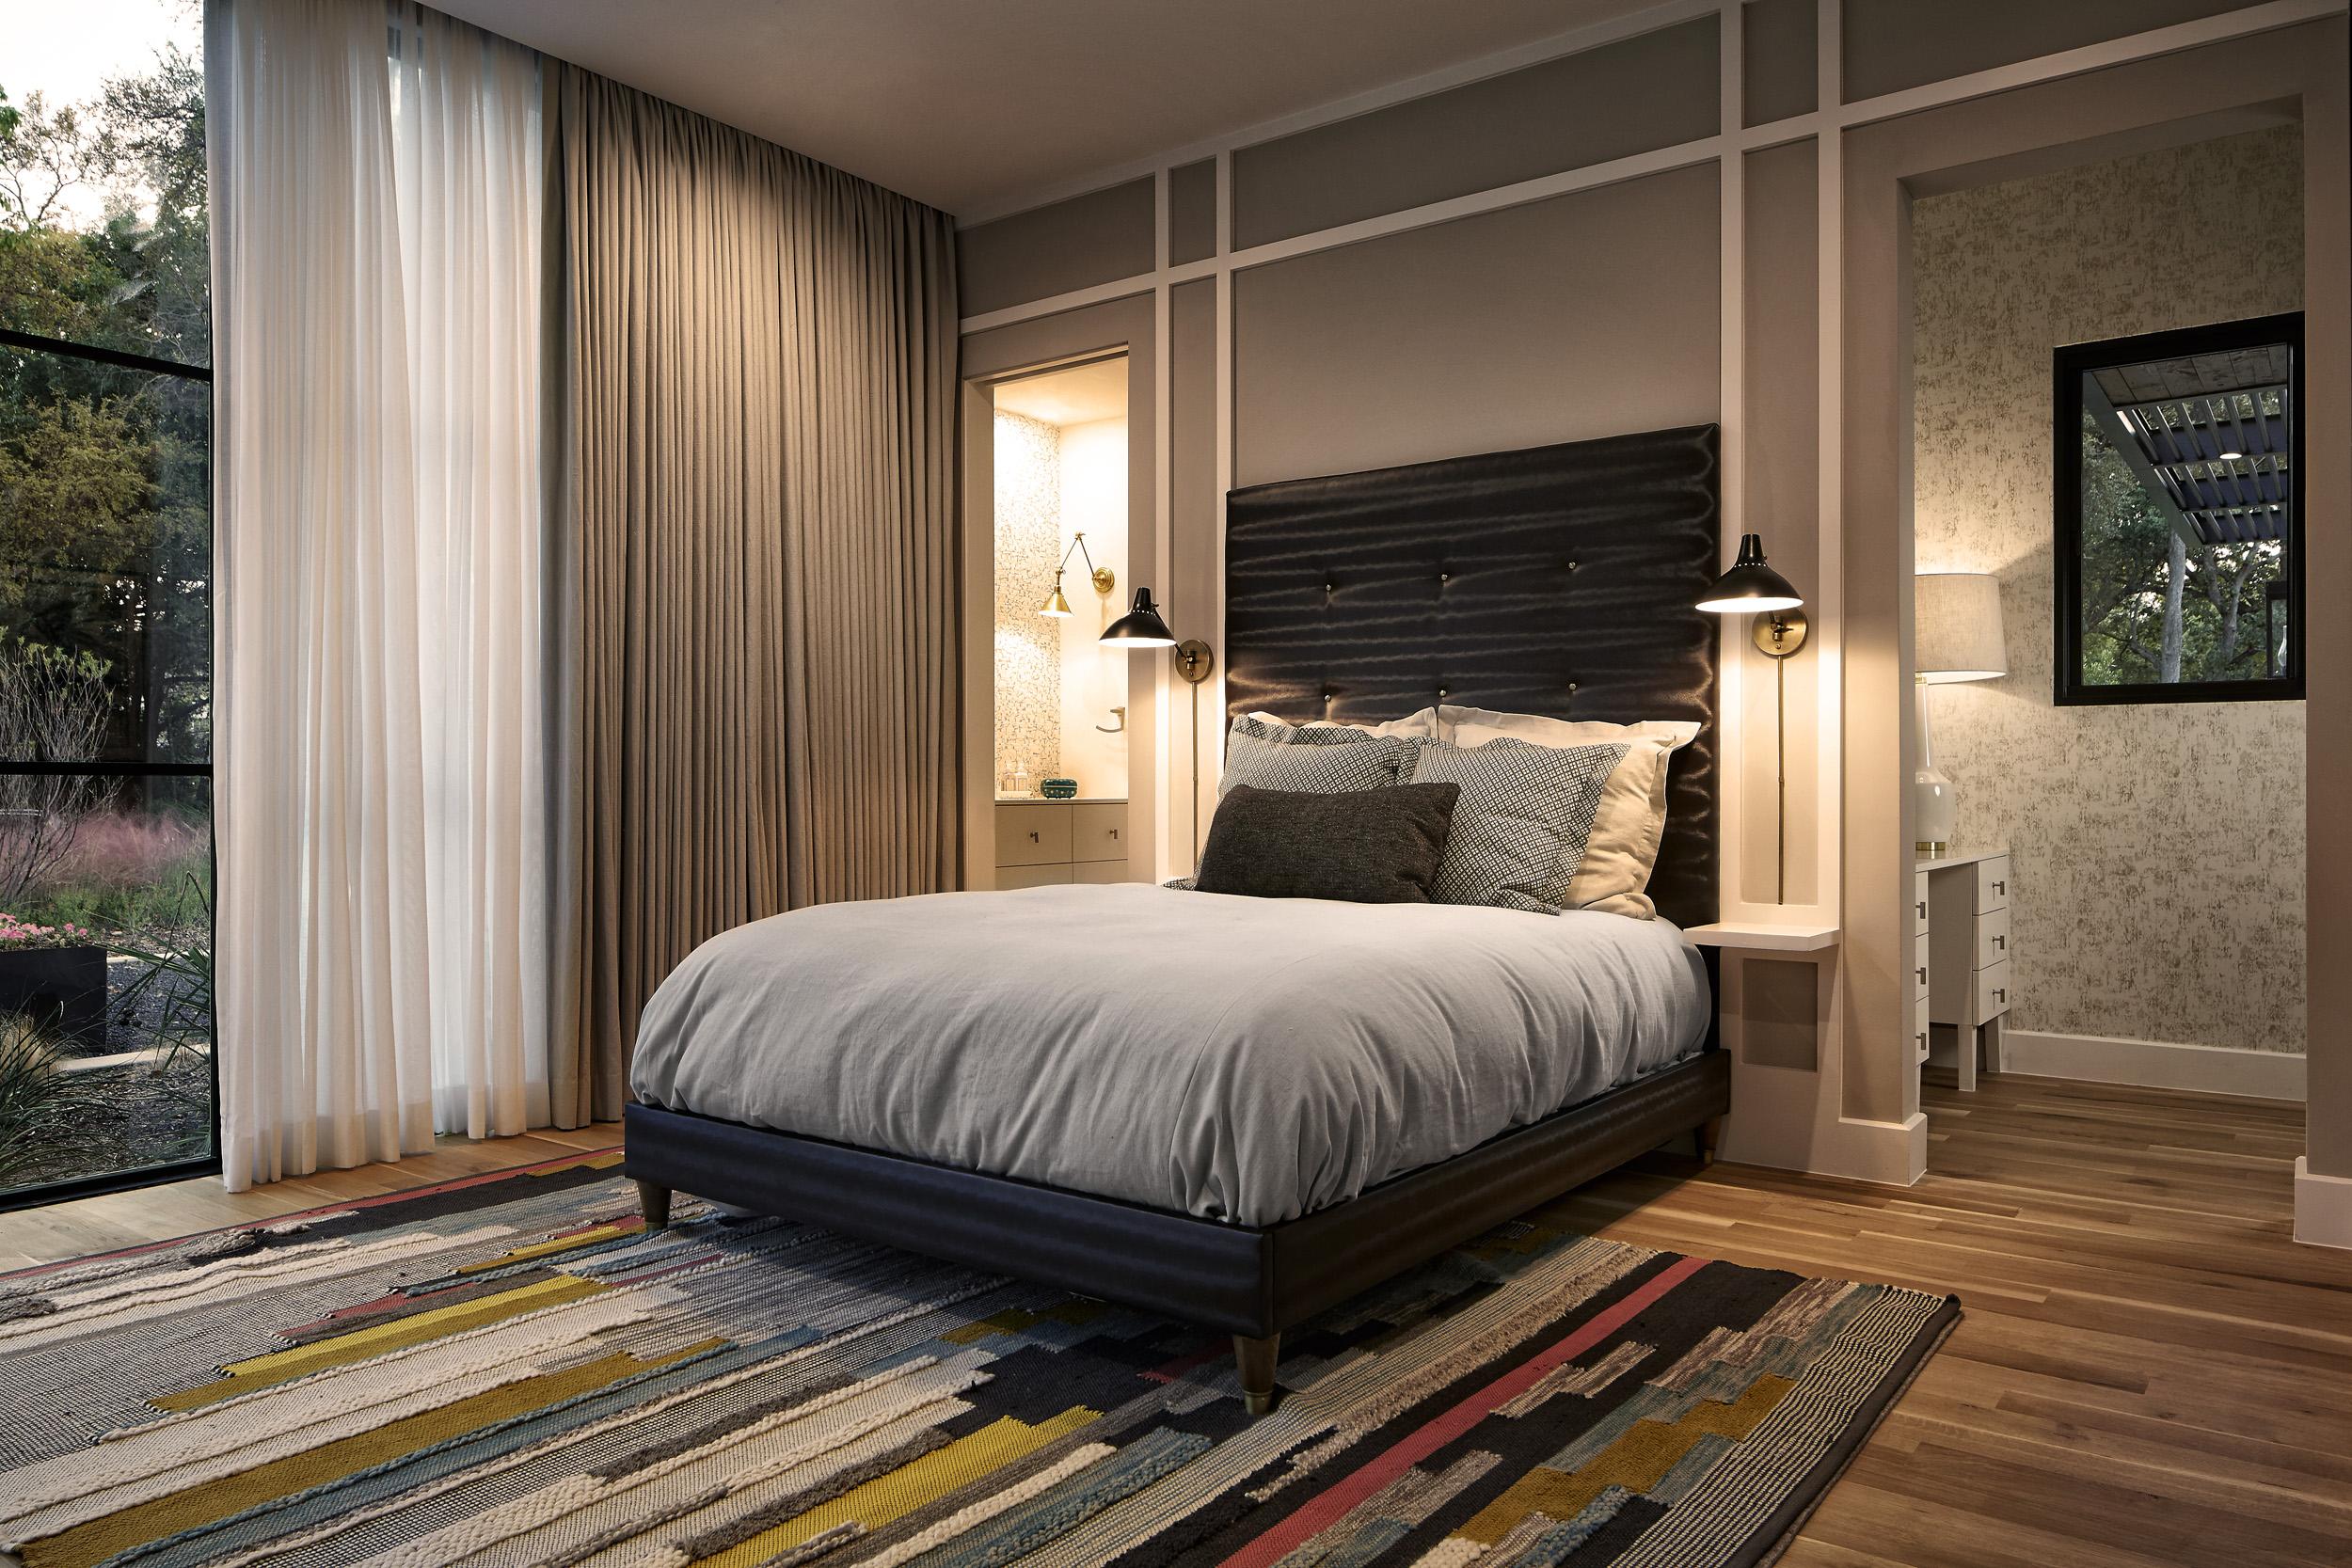 santa clara master bedroom design maestri studio top interior designers dallas texas